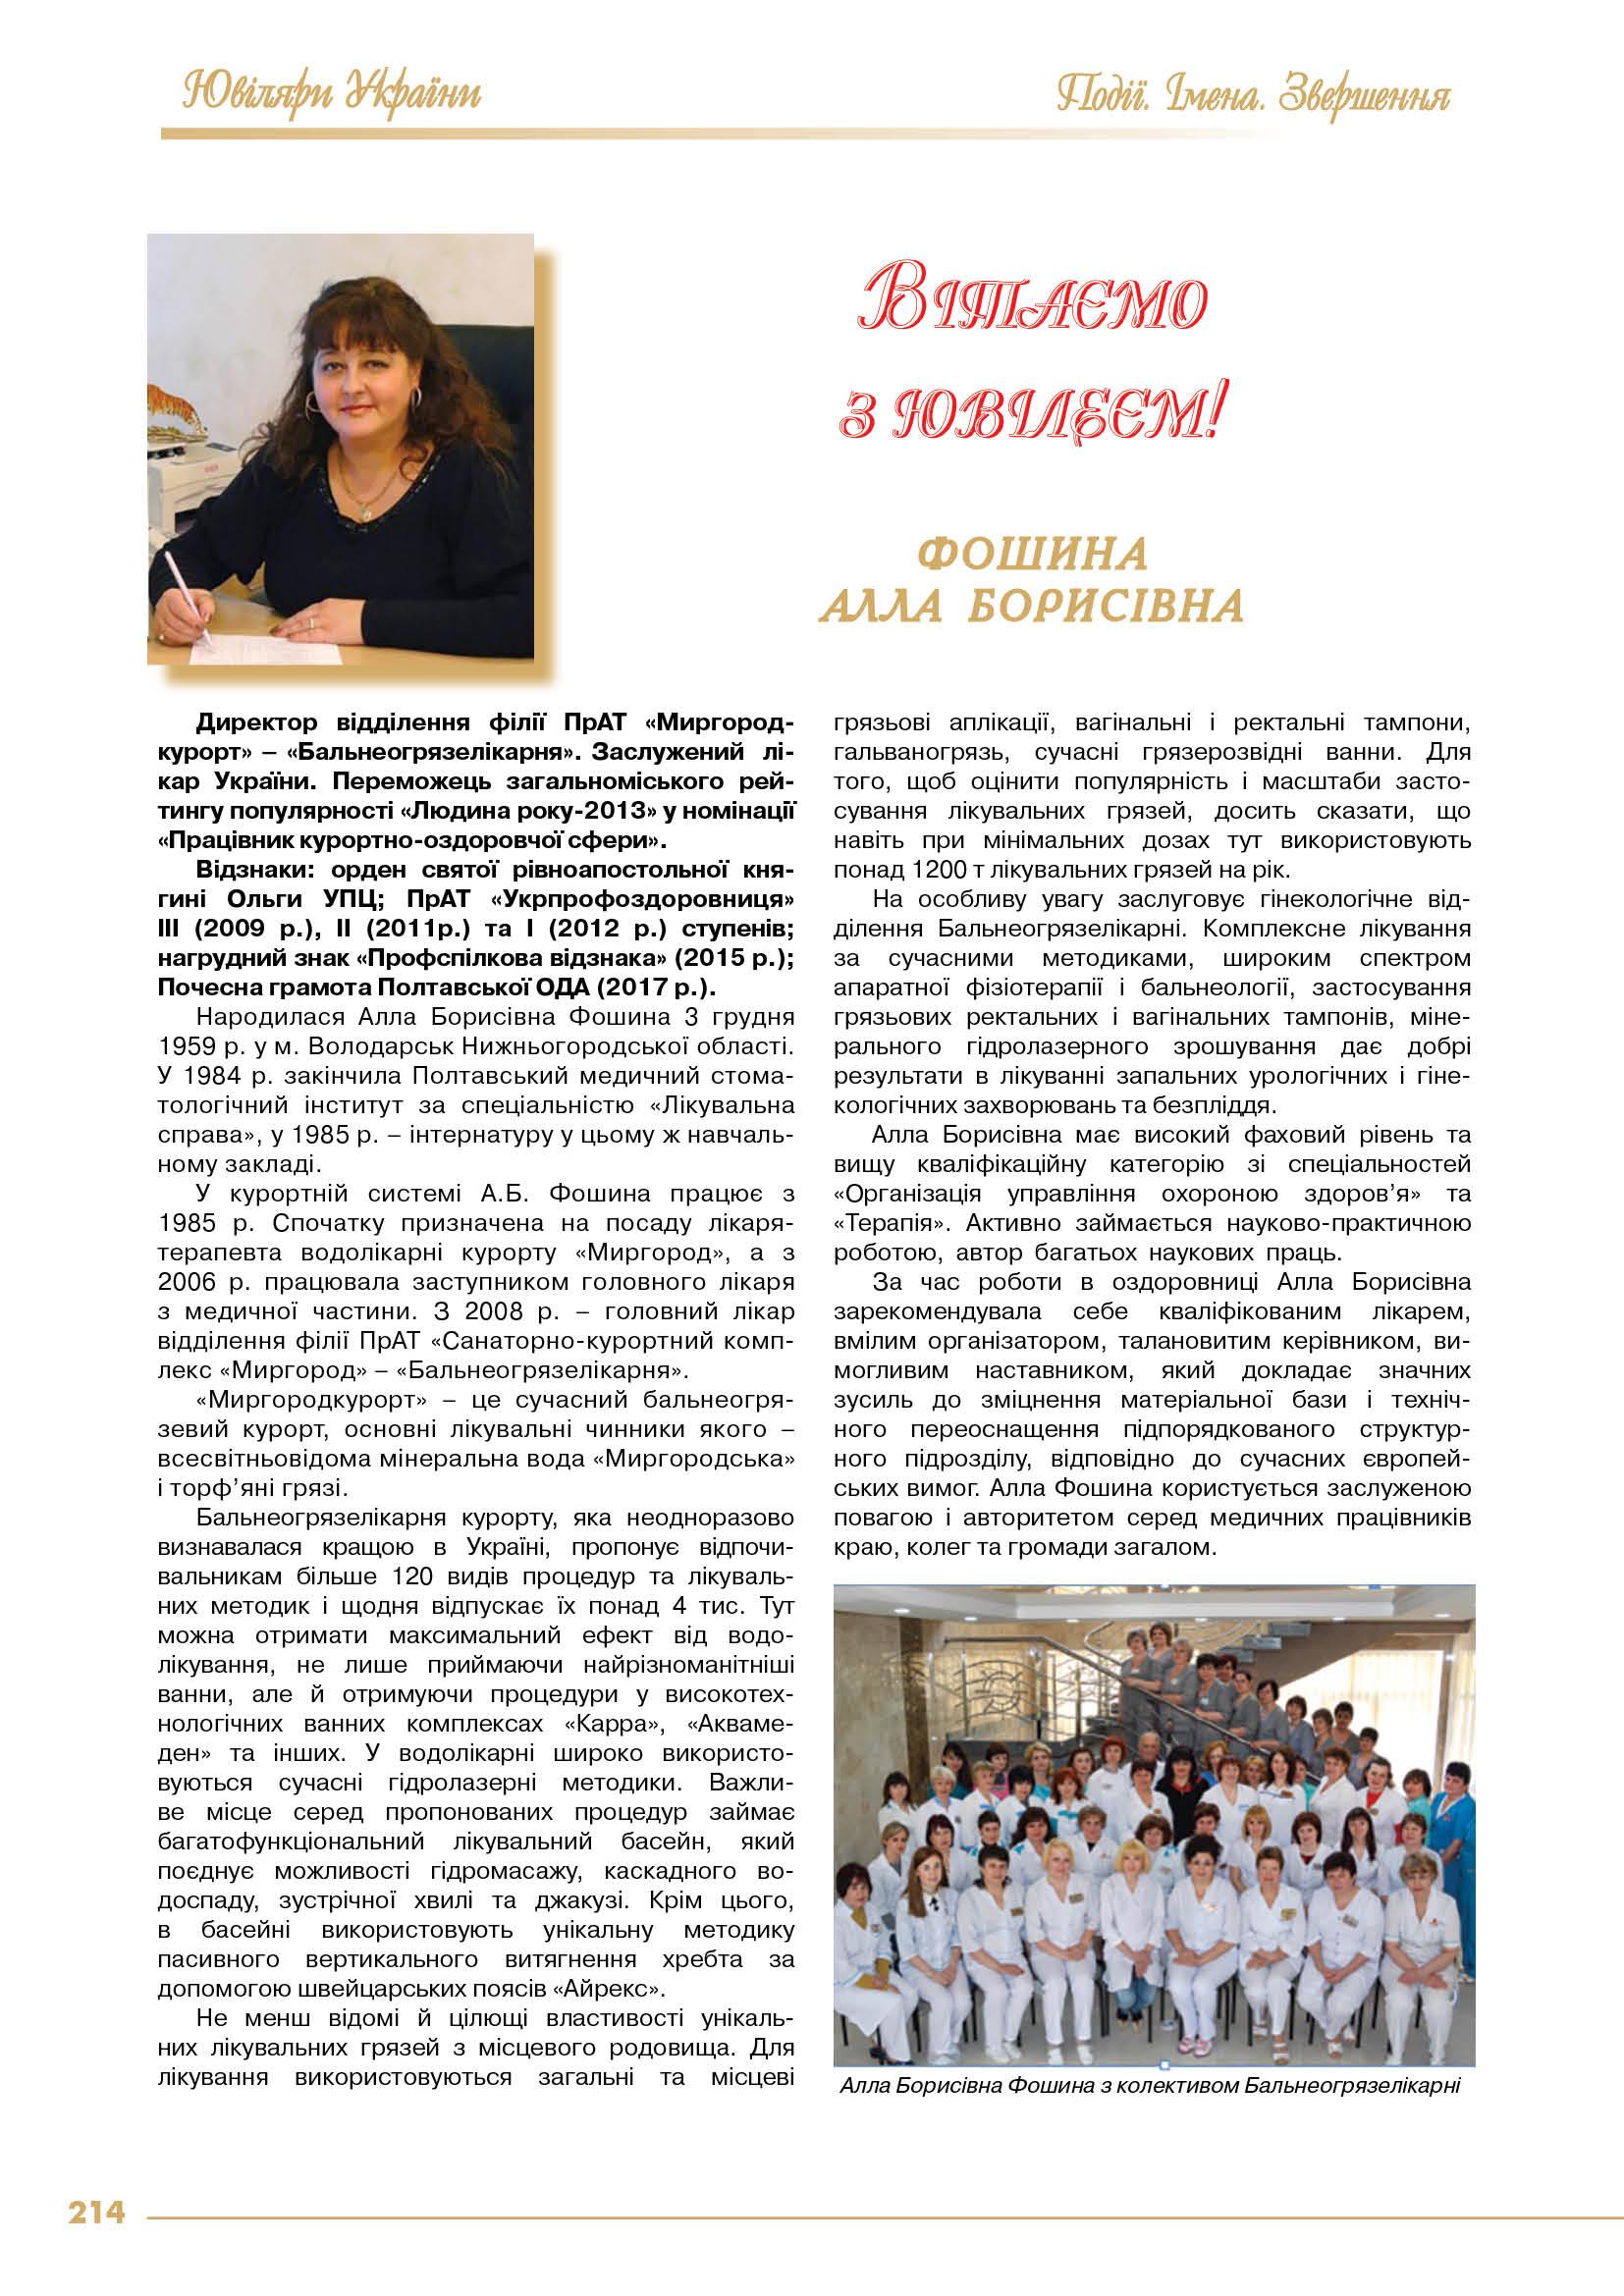 Фошина Алла Борисівна